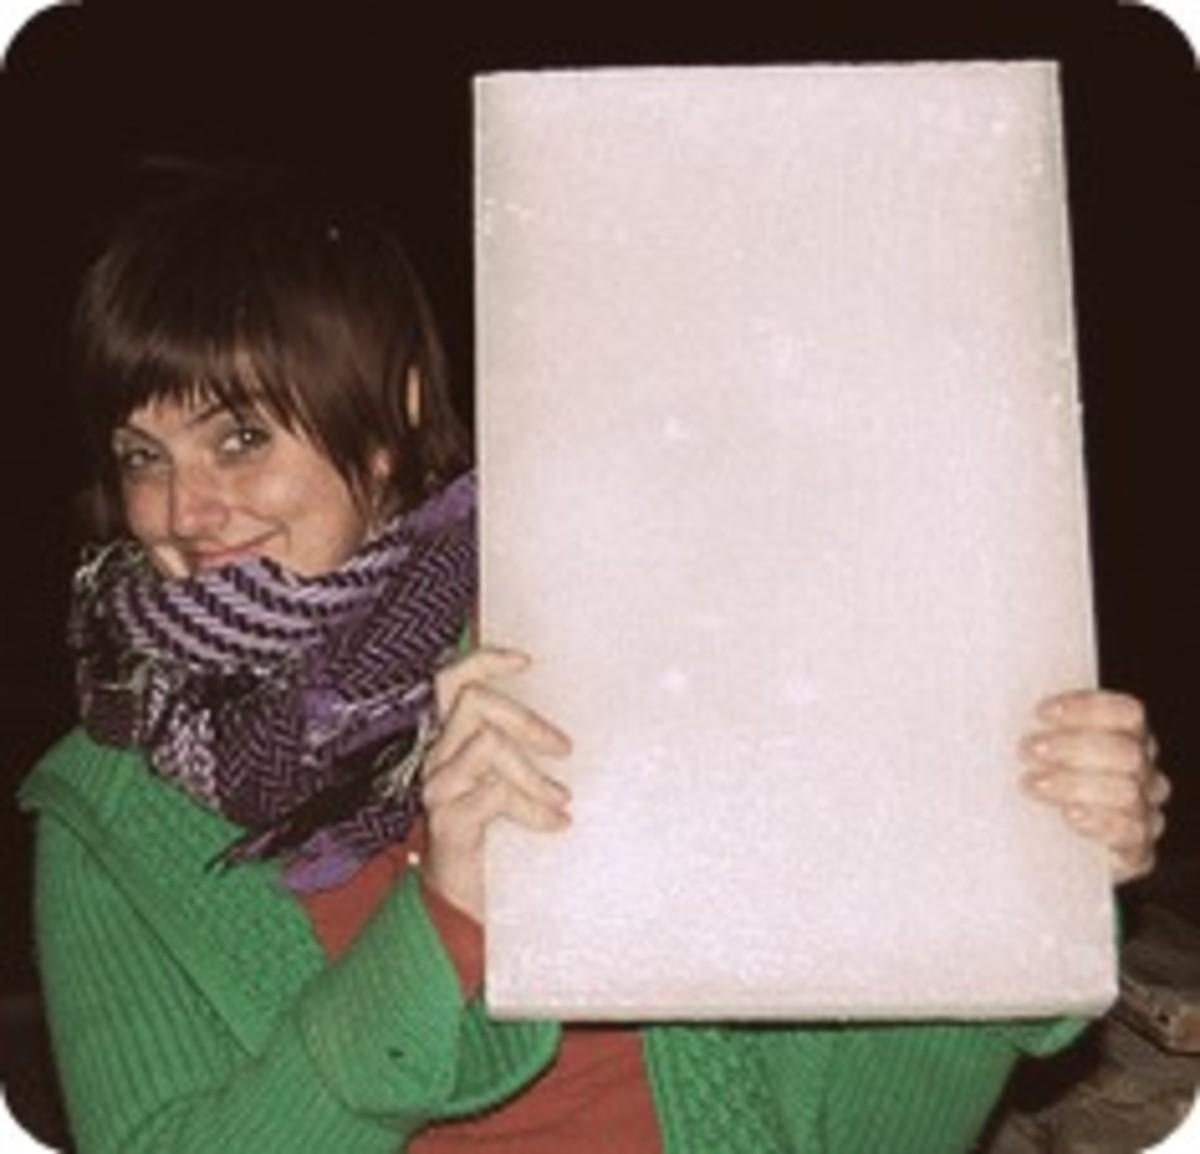 Mischievous person wielding a block of wax